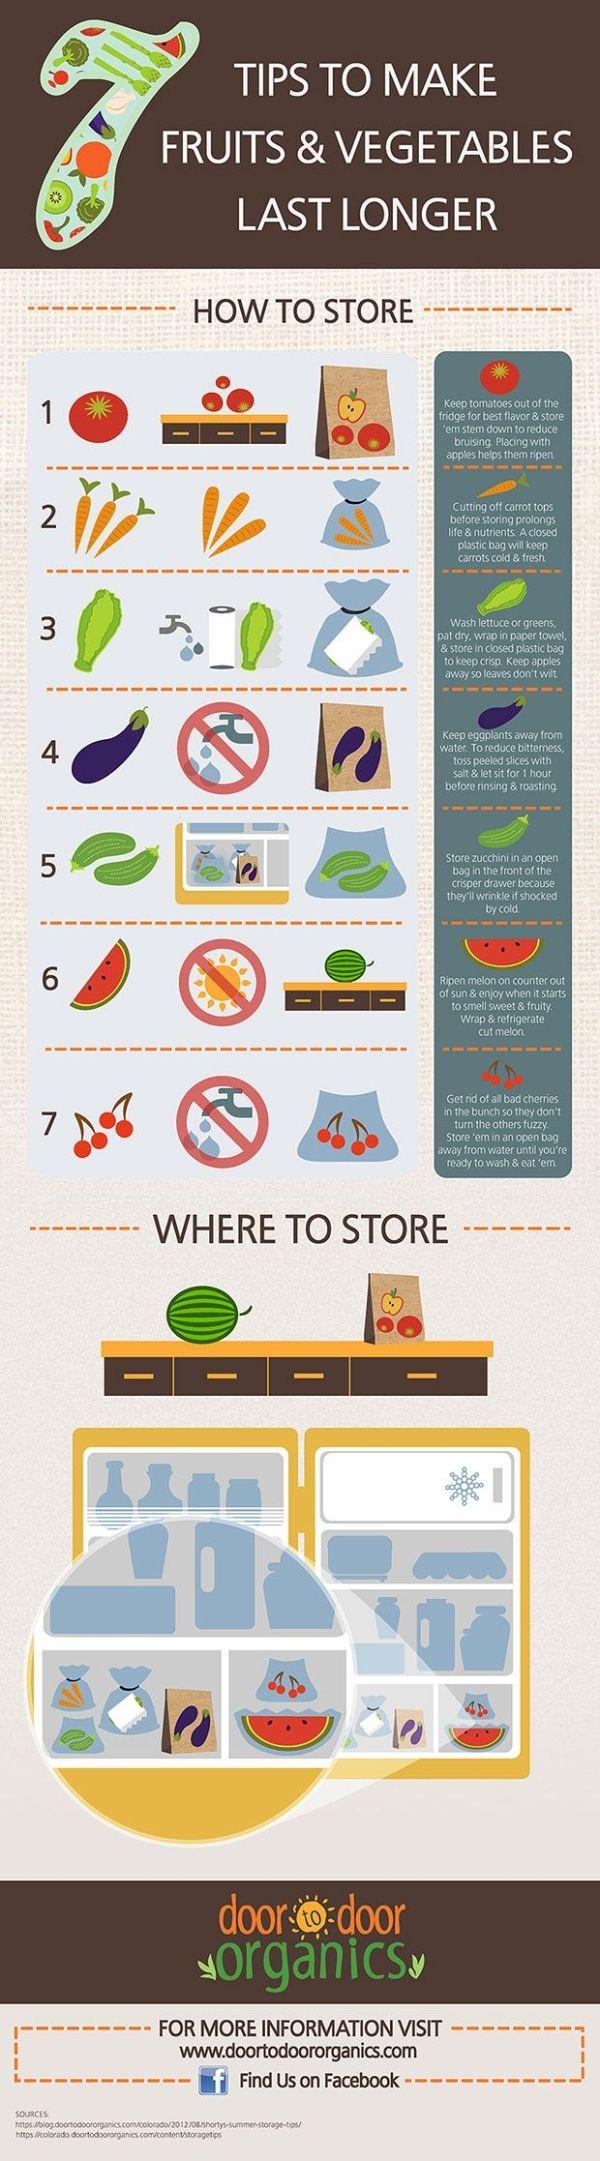 7 Tips to Make Fruits & Vegetables Last Longer